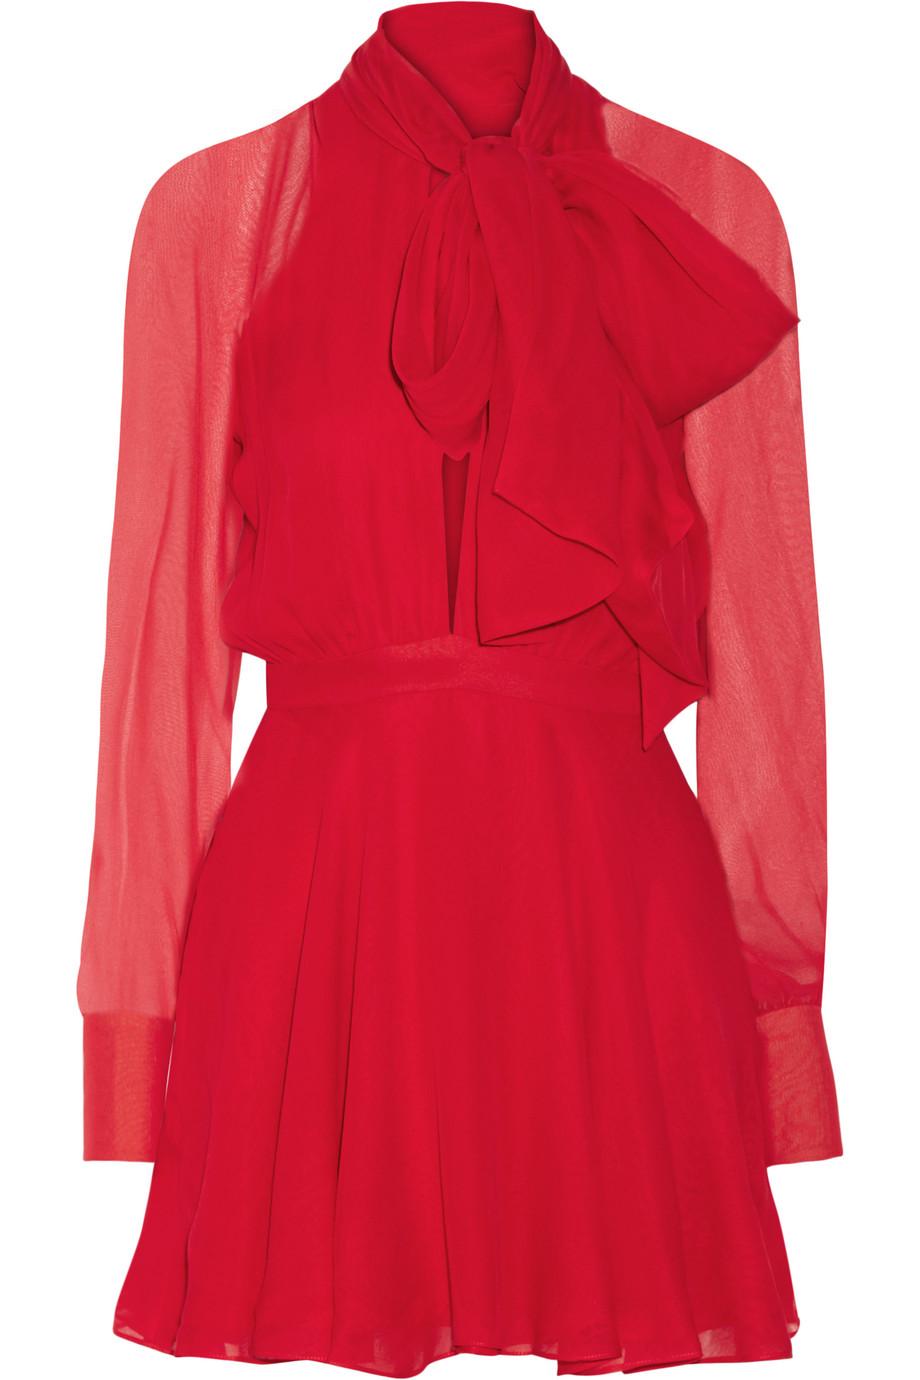 Haney Sybil Pussy-Bow Silk-Chiffon Mini Dress, Crimson, Women's, Size: 4